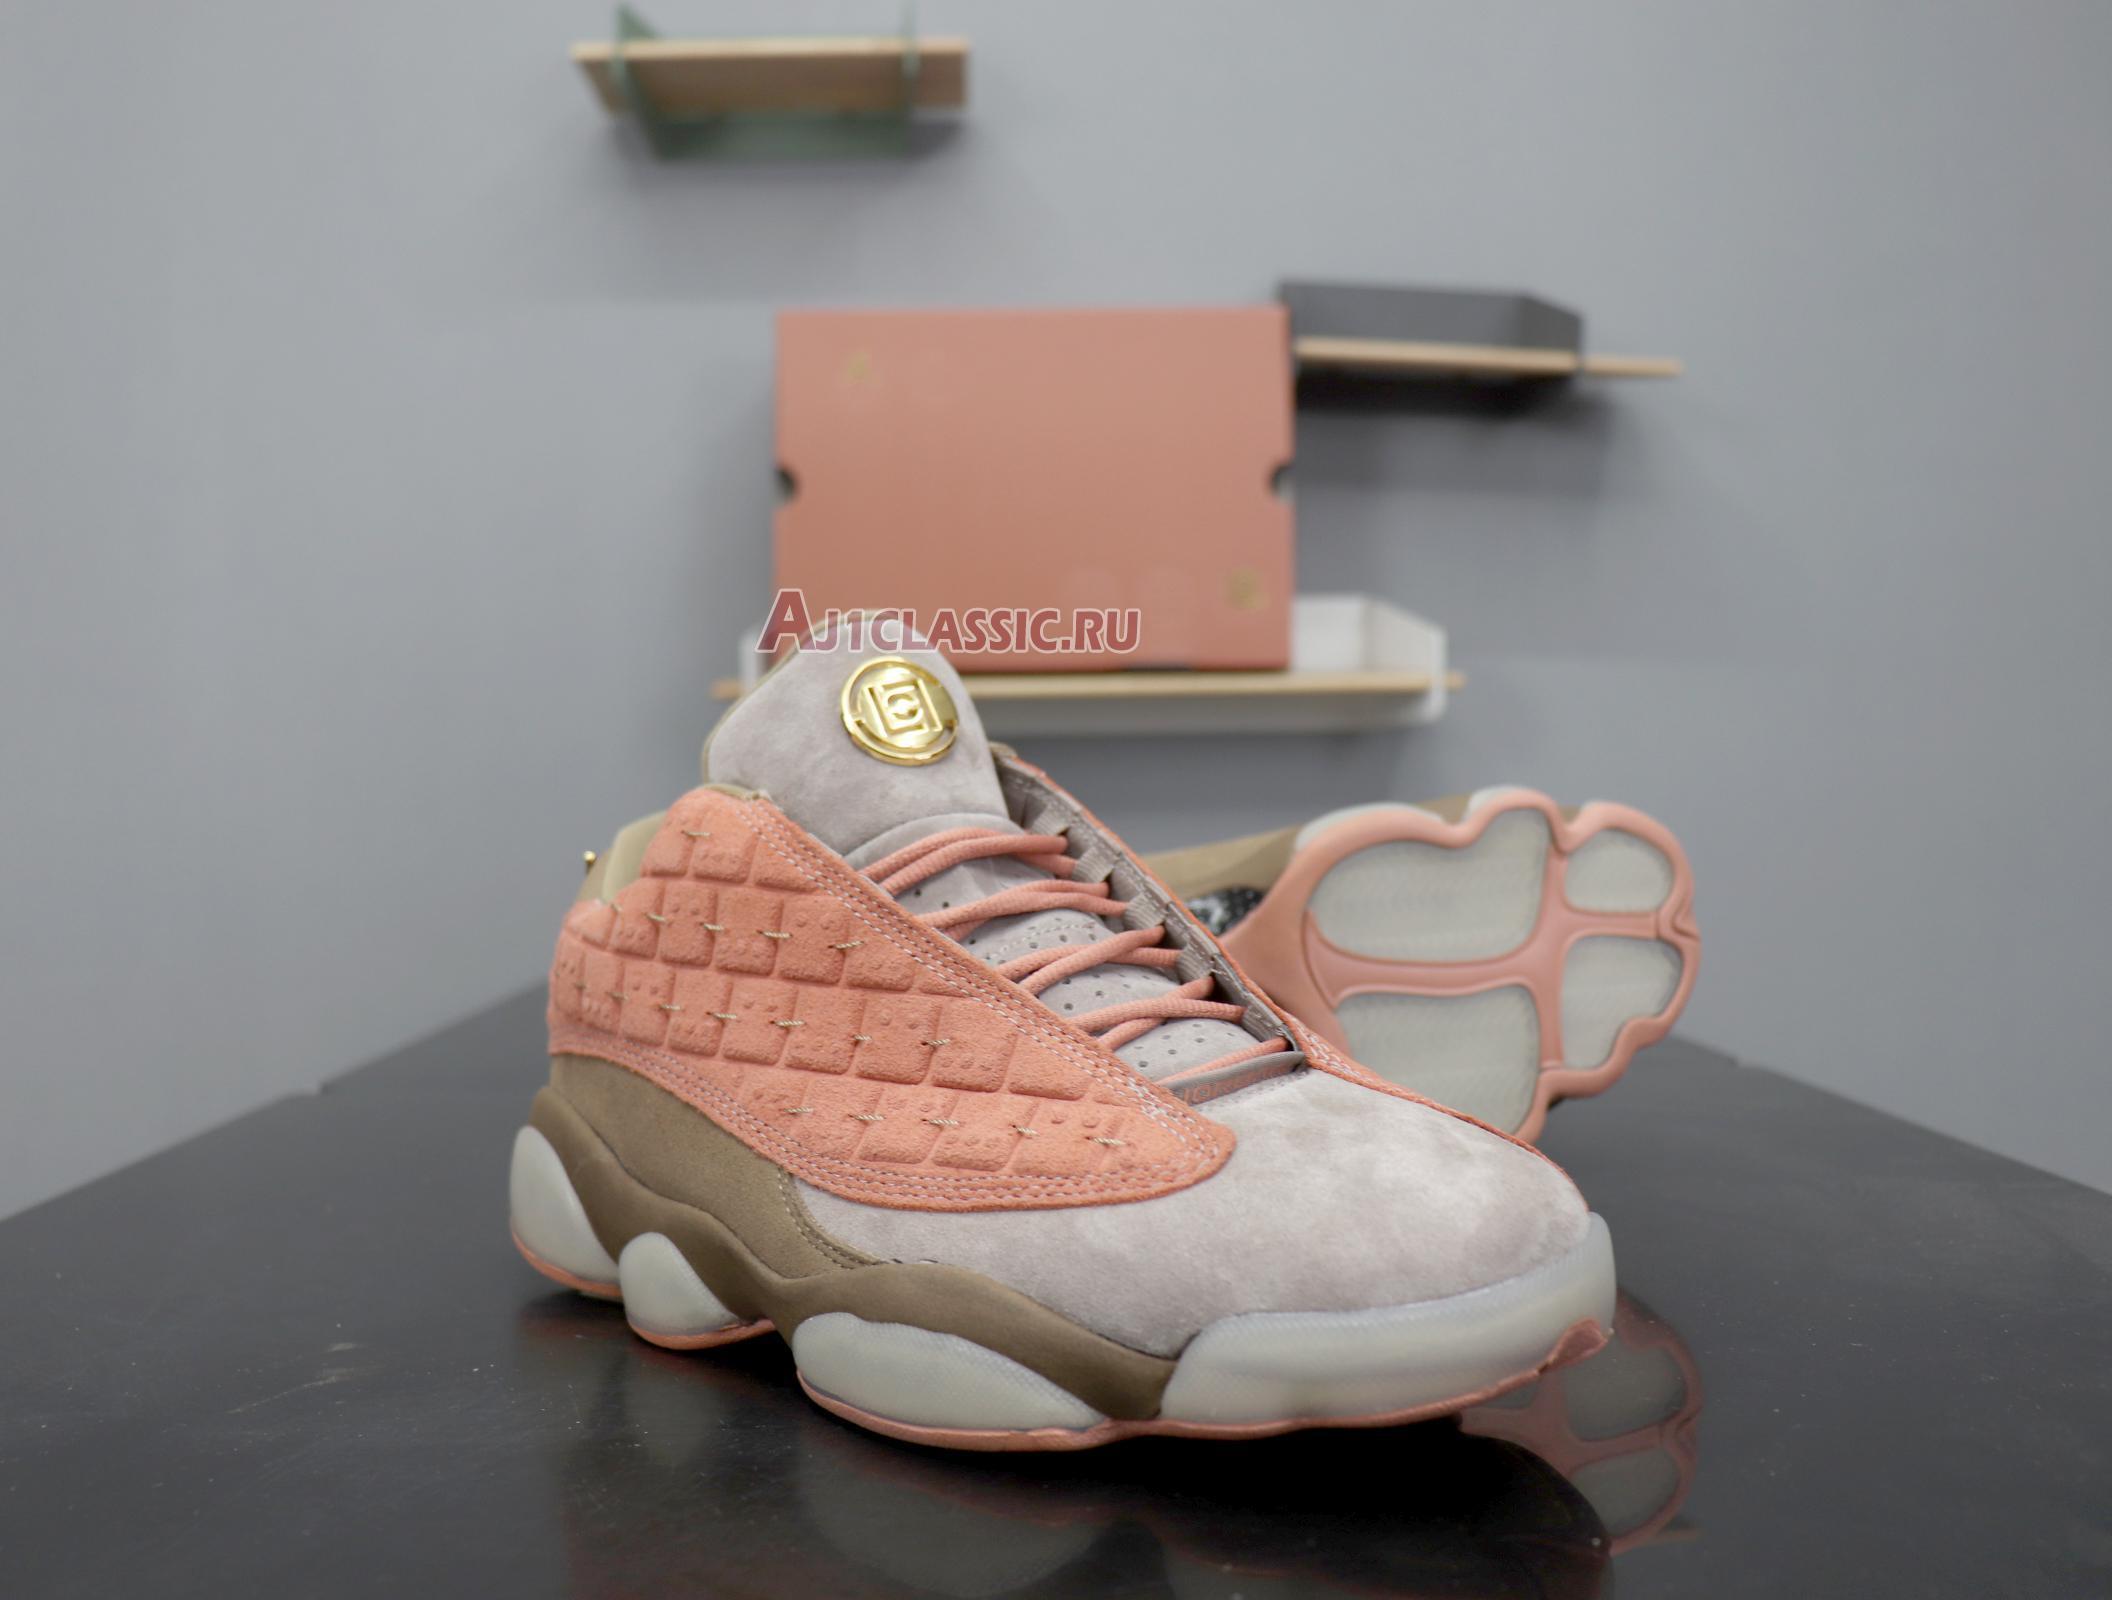 "CLOT x Air Jordan 13 Retro Low NRG ""Terracotta"" AT3102-200"